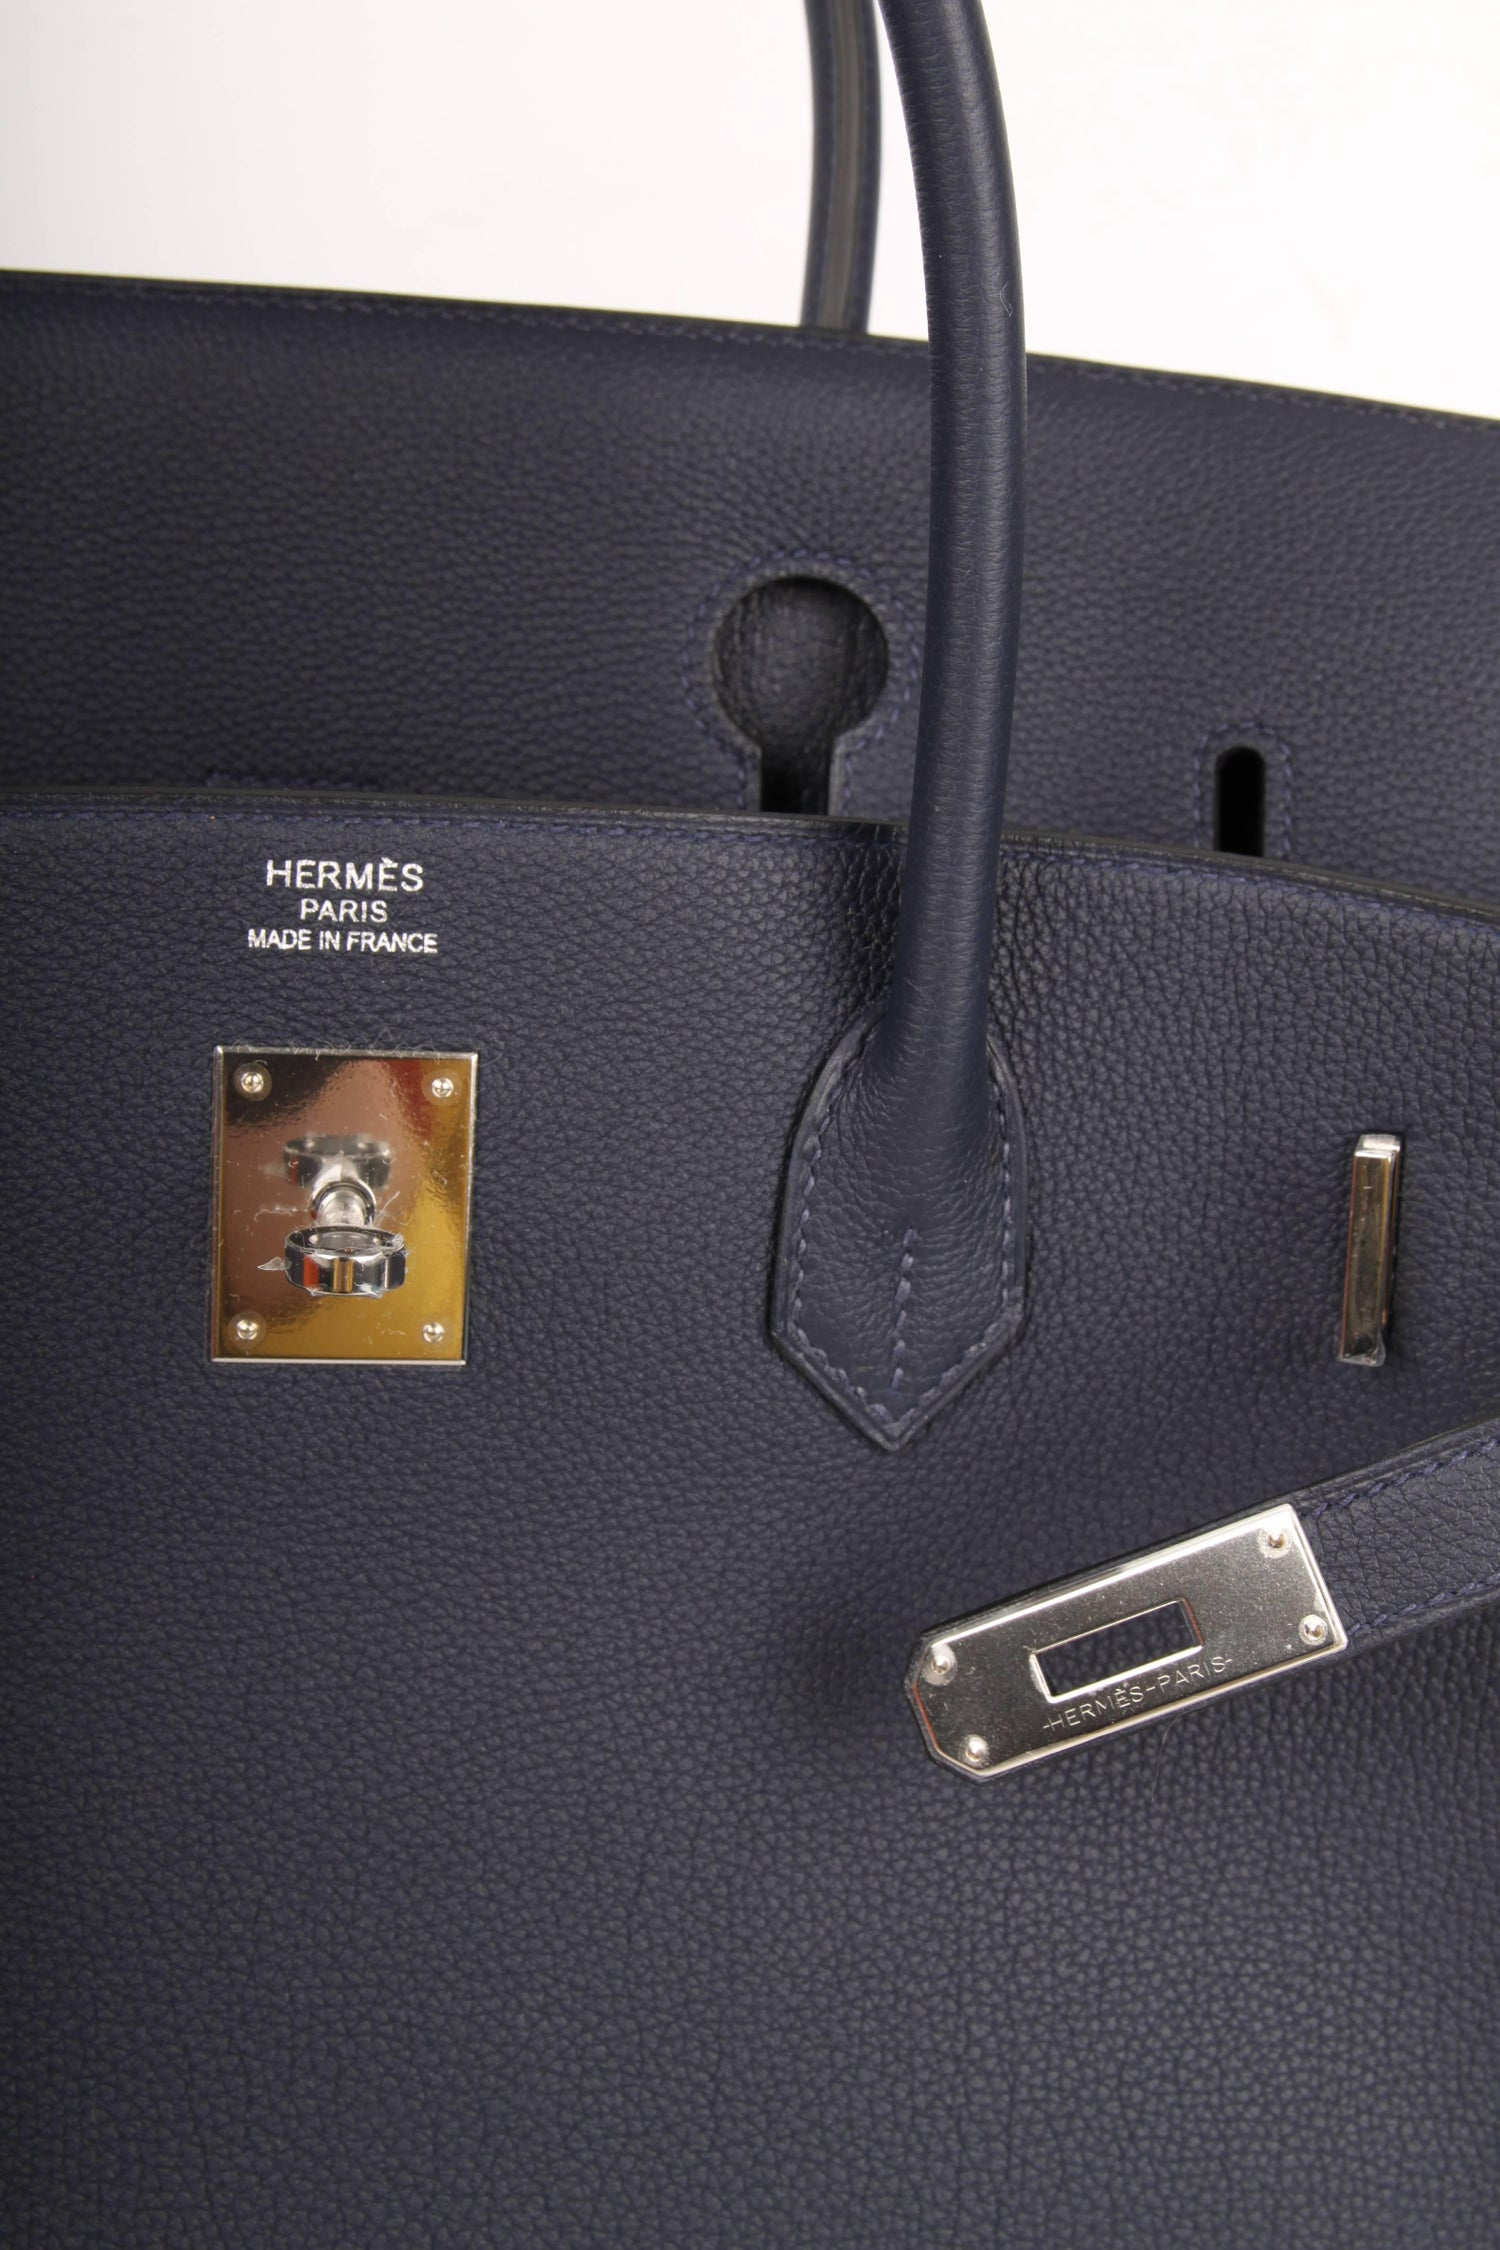 2be1a39fc0bf Hermès Birkin Bag 40 - Bleu Nuit 2018 at 1stdibs